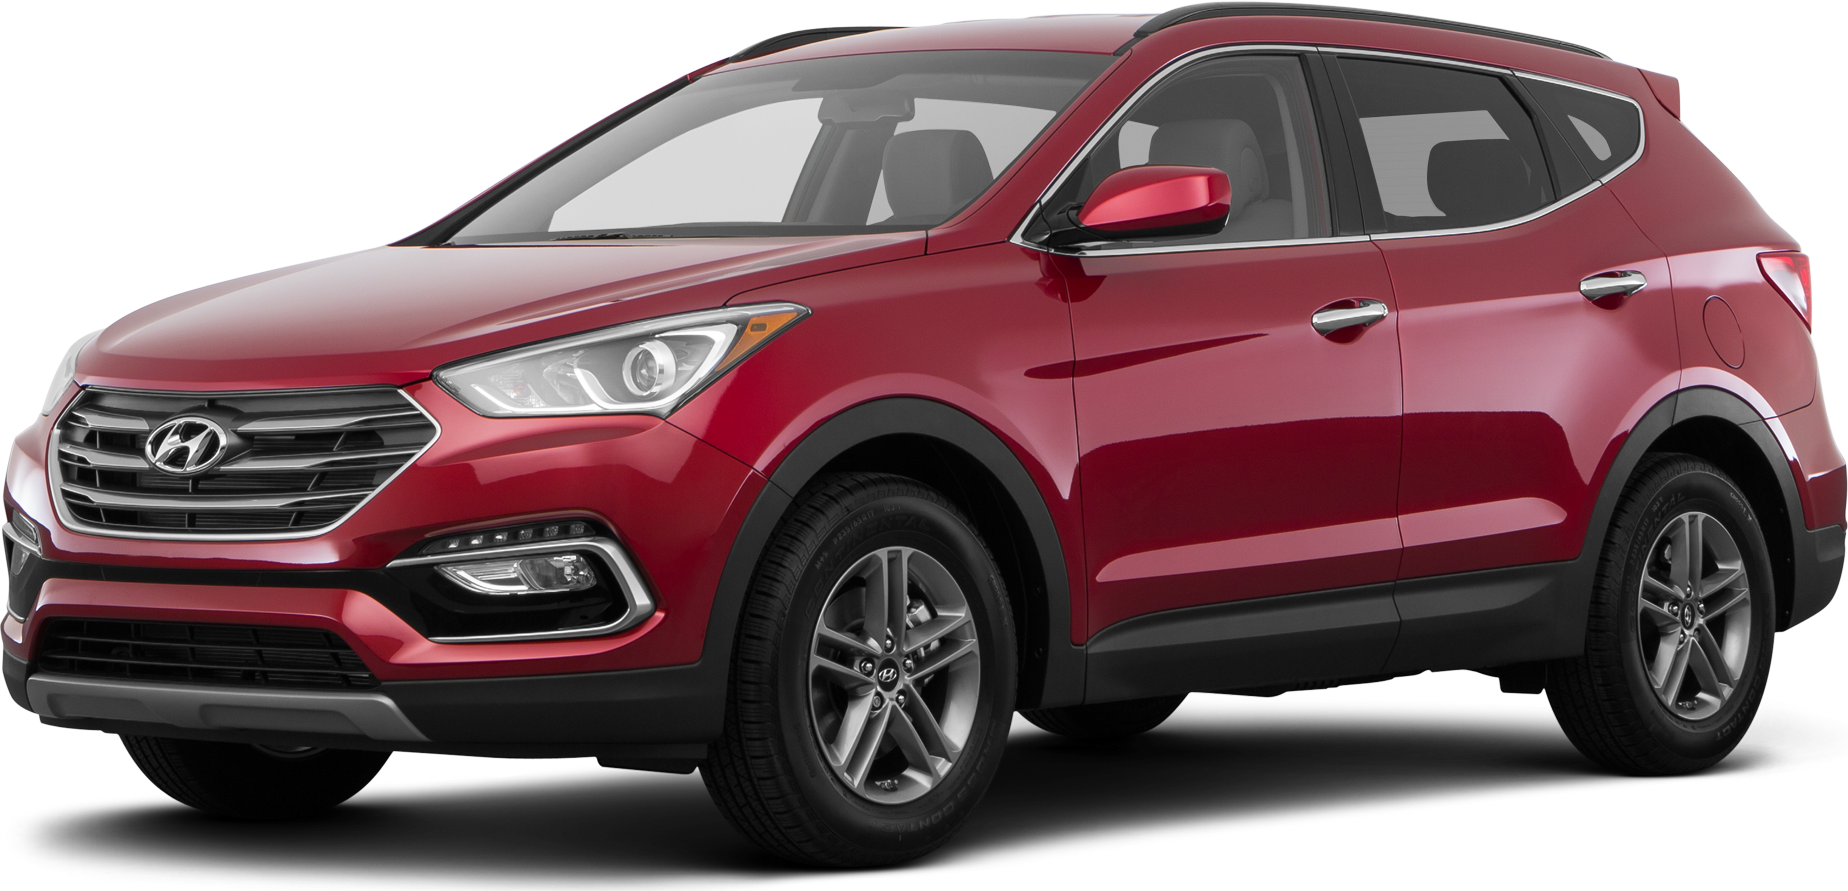 2016 Hyundai Santa Fe   Pricing, Ratings, Expert Review   Kelley